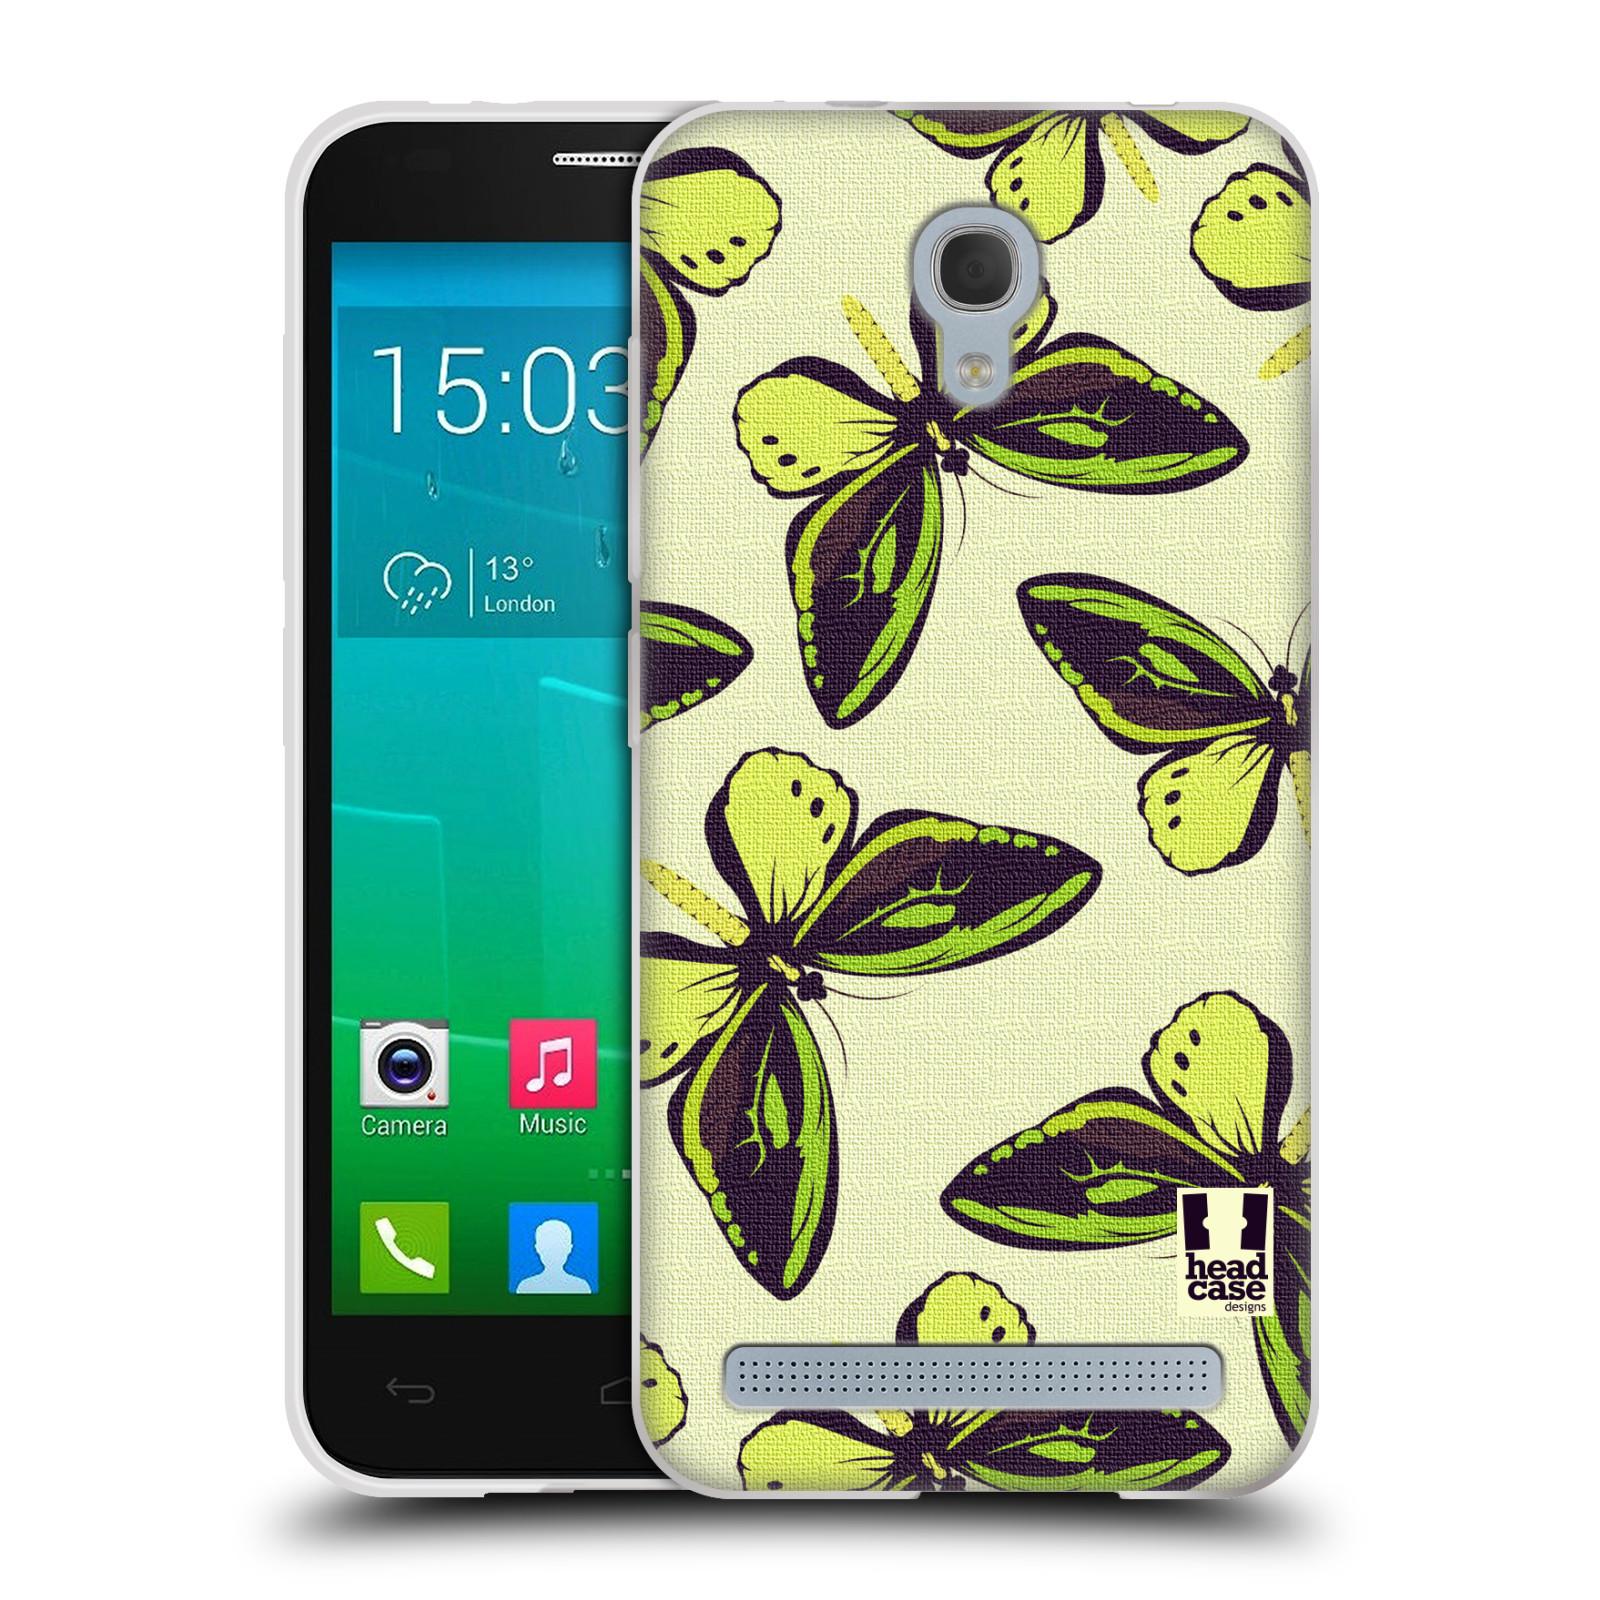 HEAD CASE silikonový obal na mobil Alcatel Idol 2 MINI S 6036Y vzor Motýlci Poseidon zelená